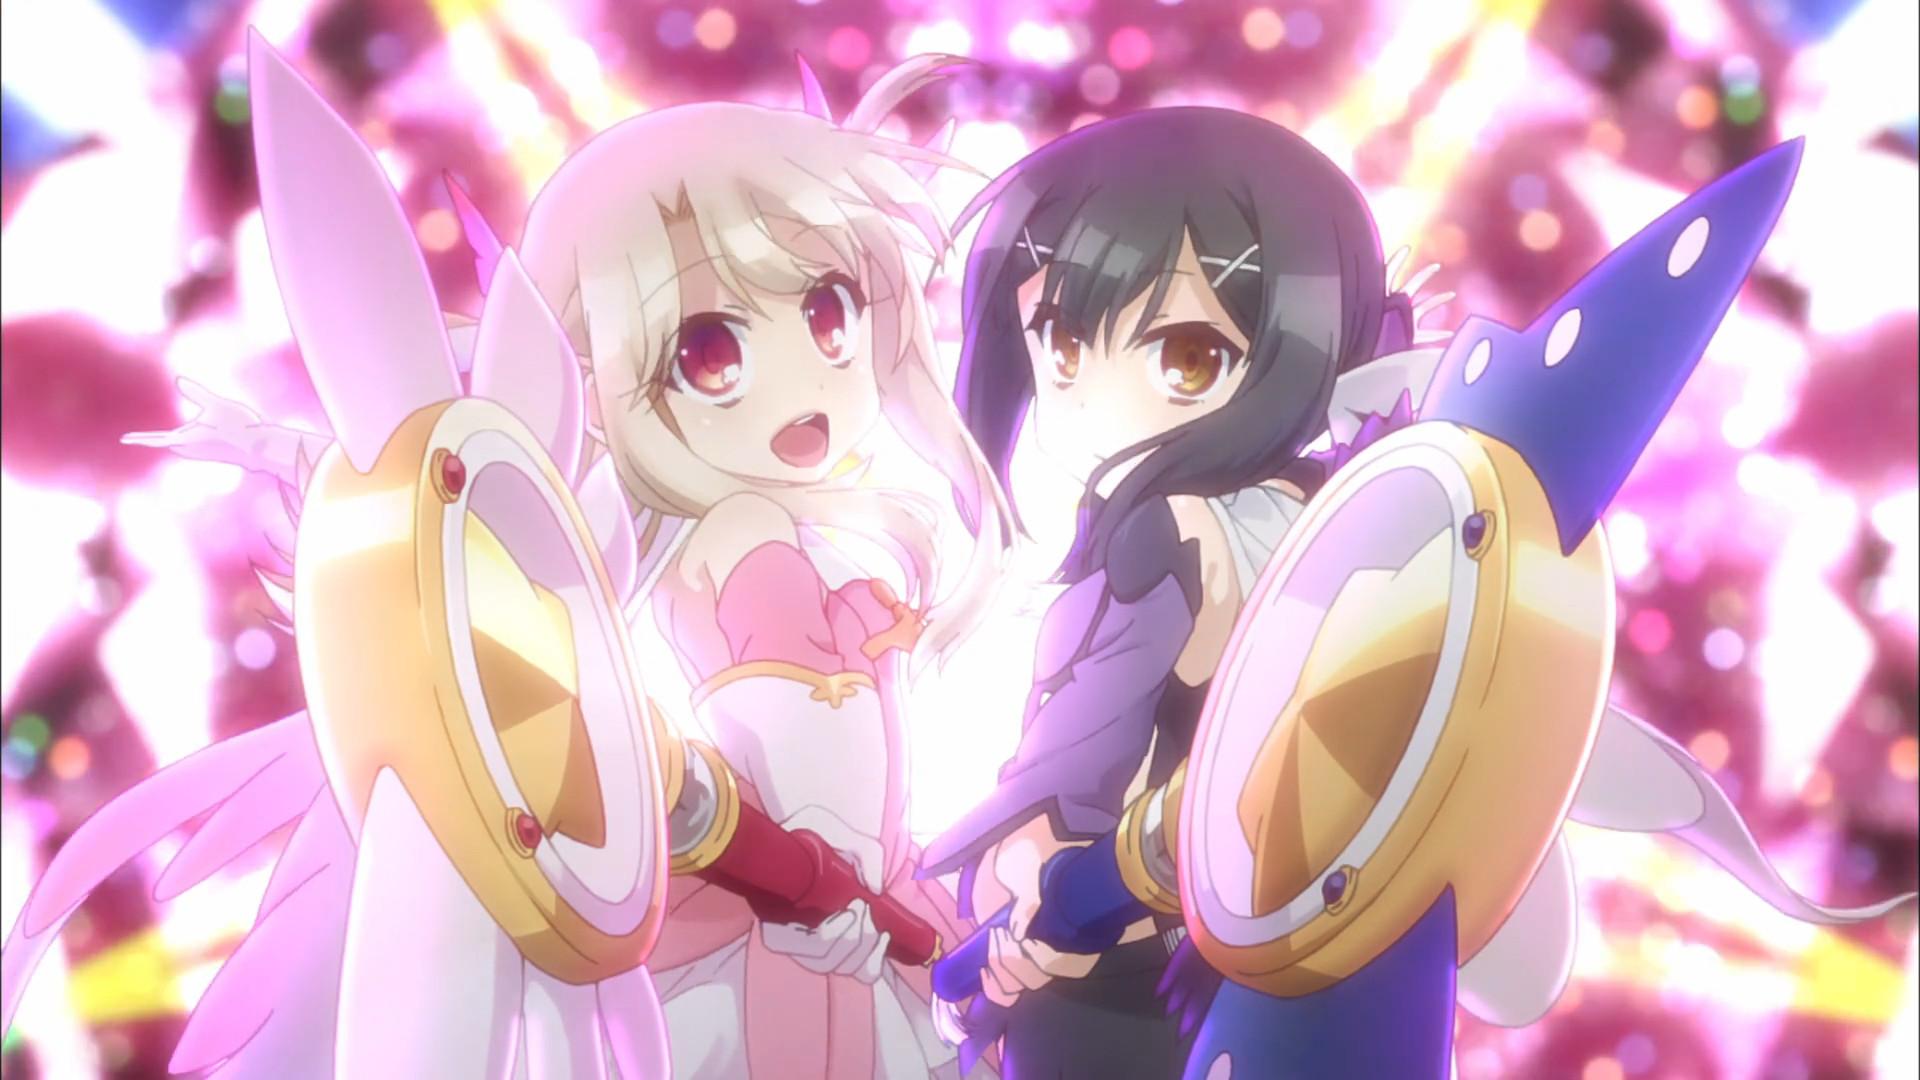 Sentai Filmworks Licenses Fate Kaleid Liner Prisma Illya 2wei